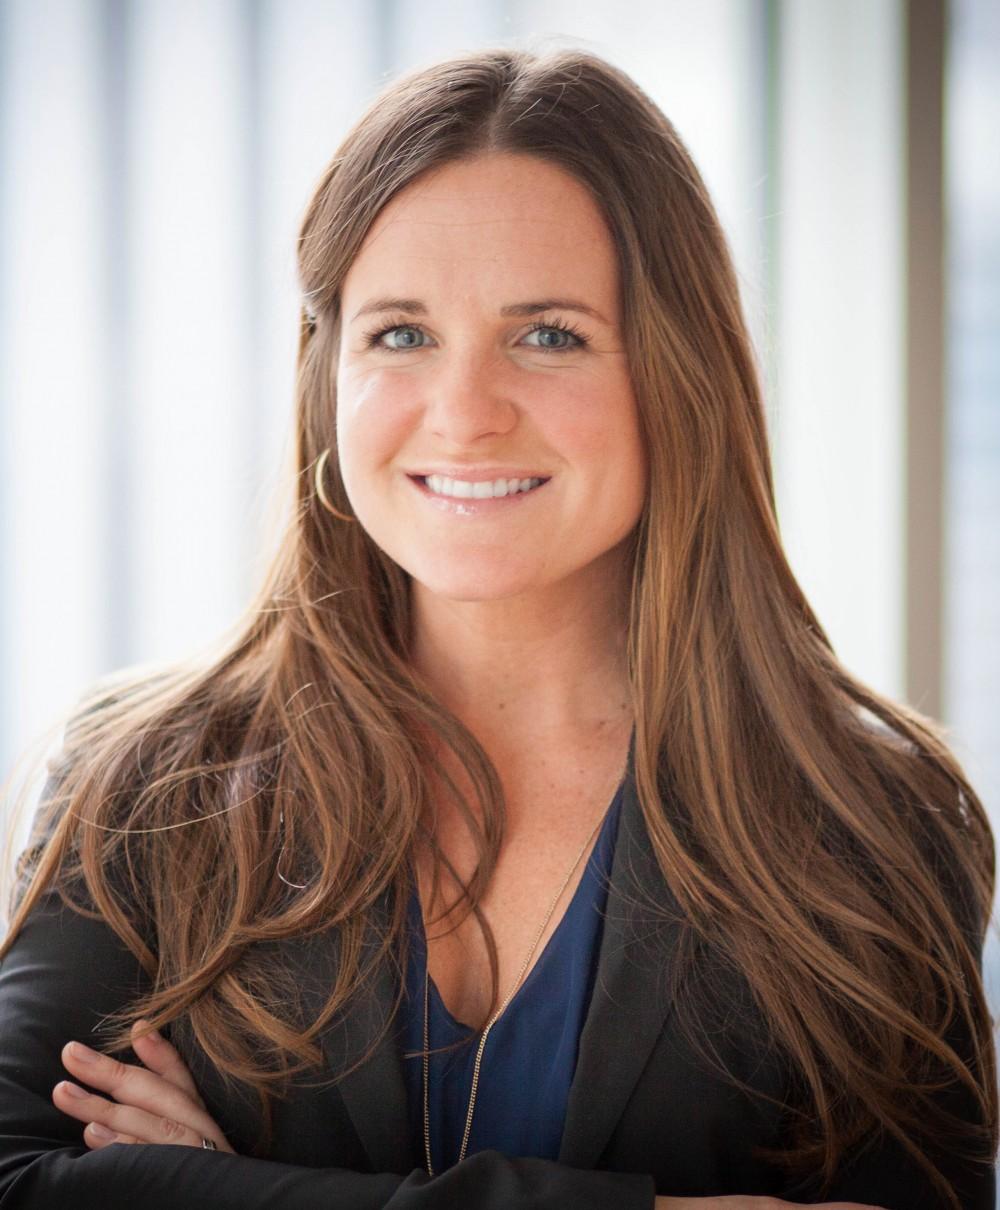 Maureen Hoersten Headshot CRO - LaSalle Network